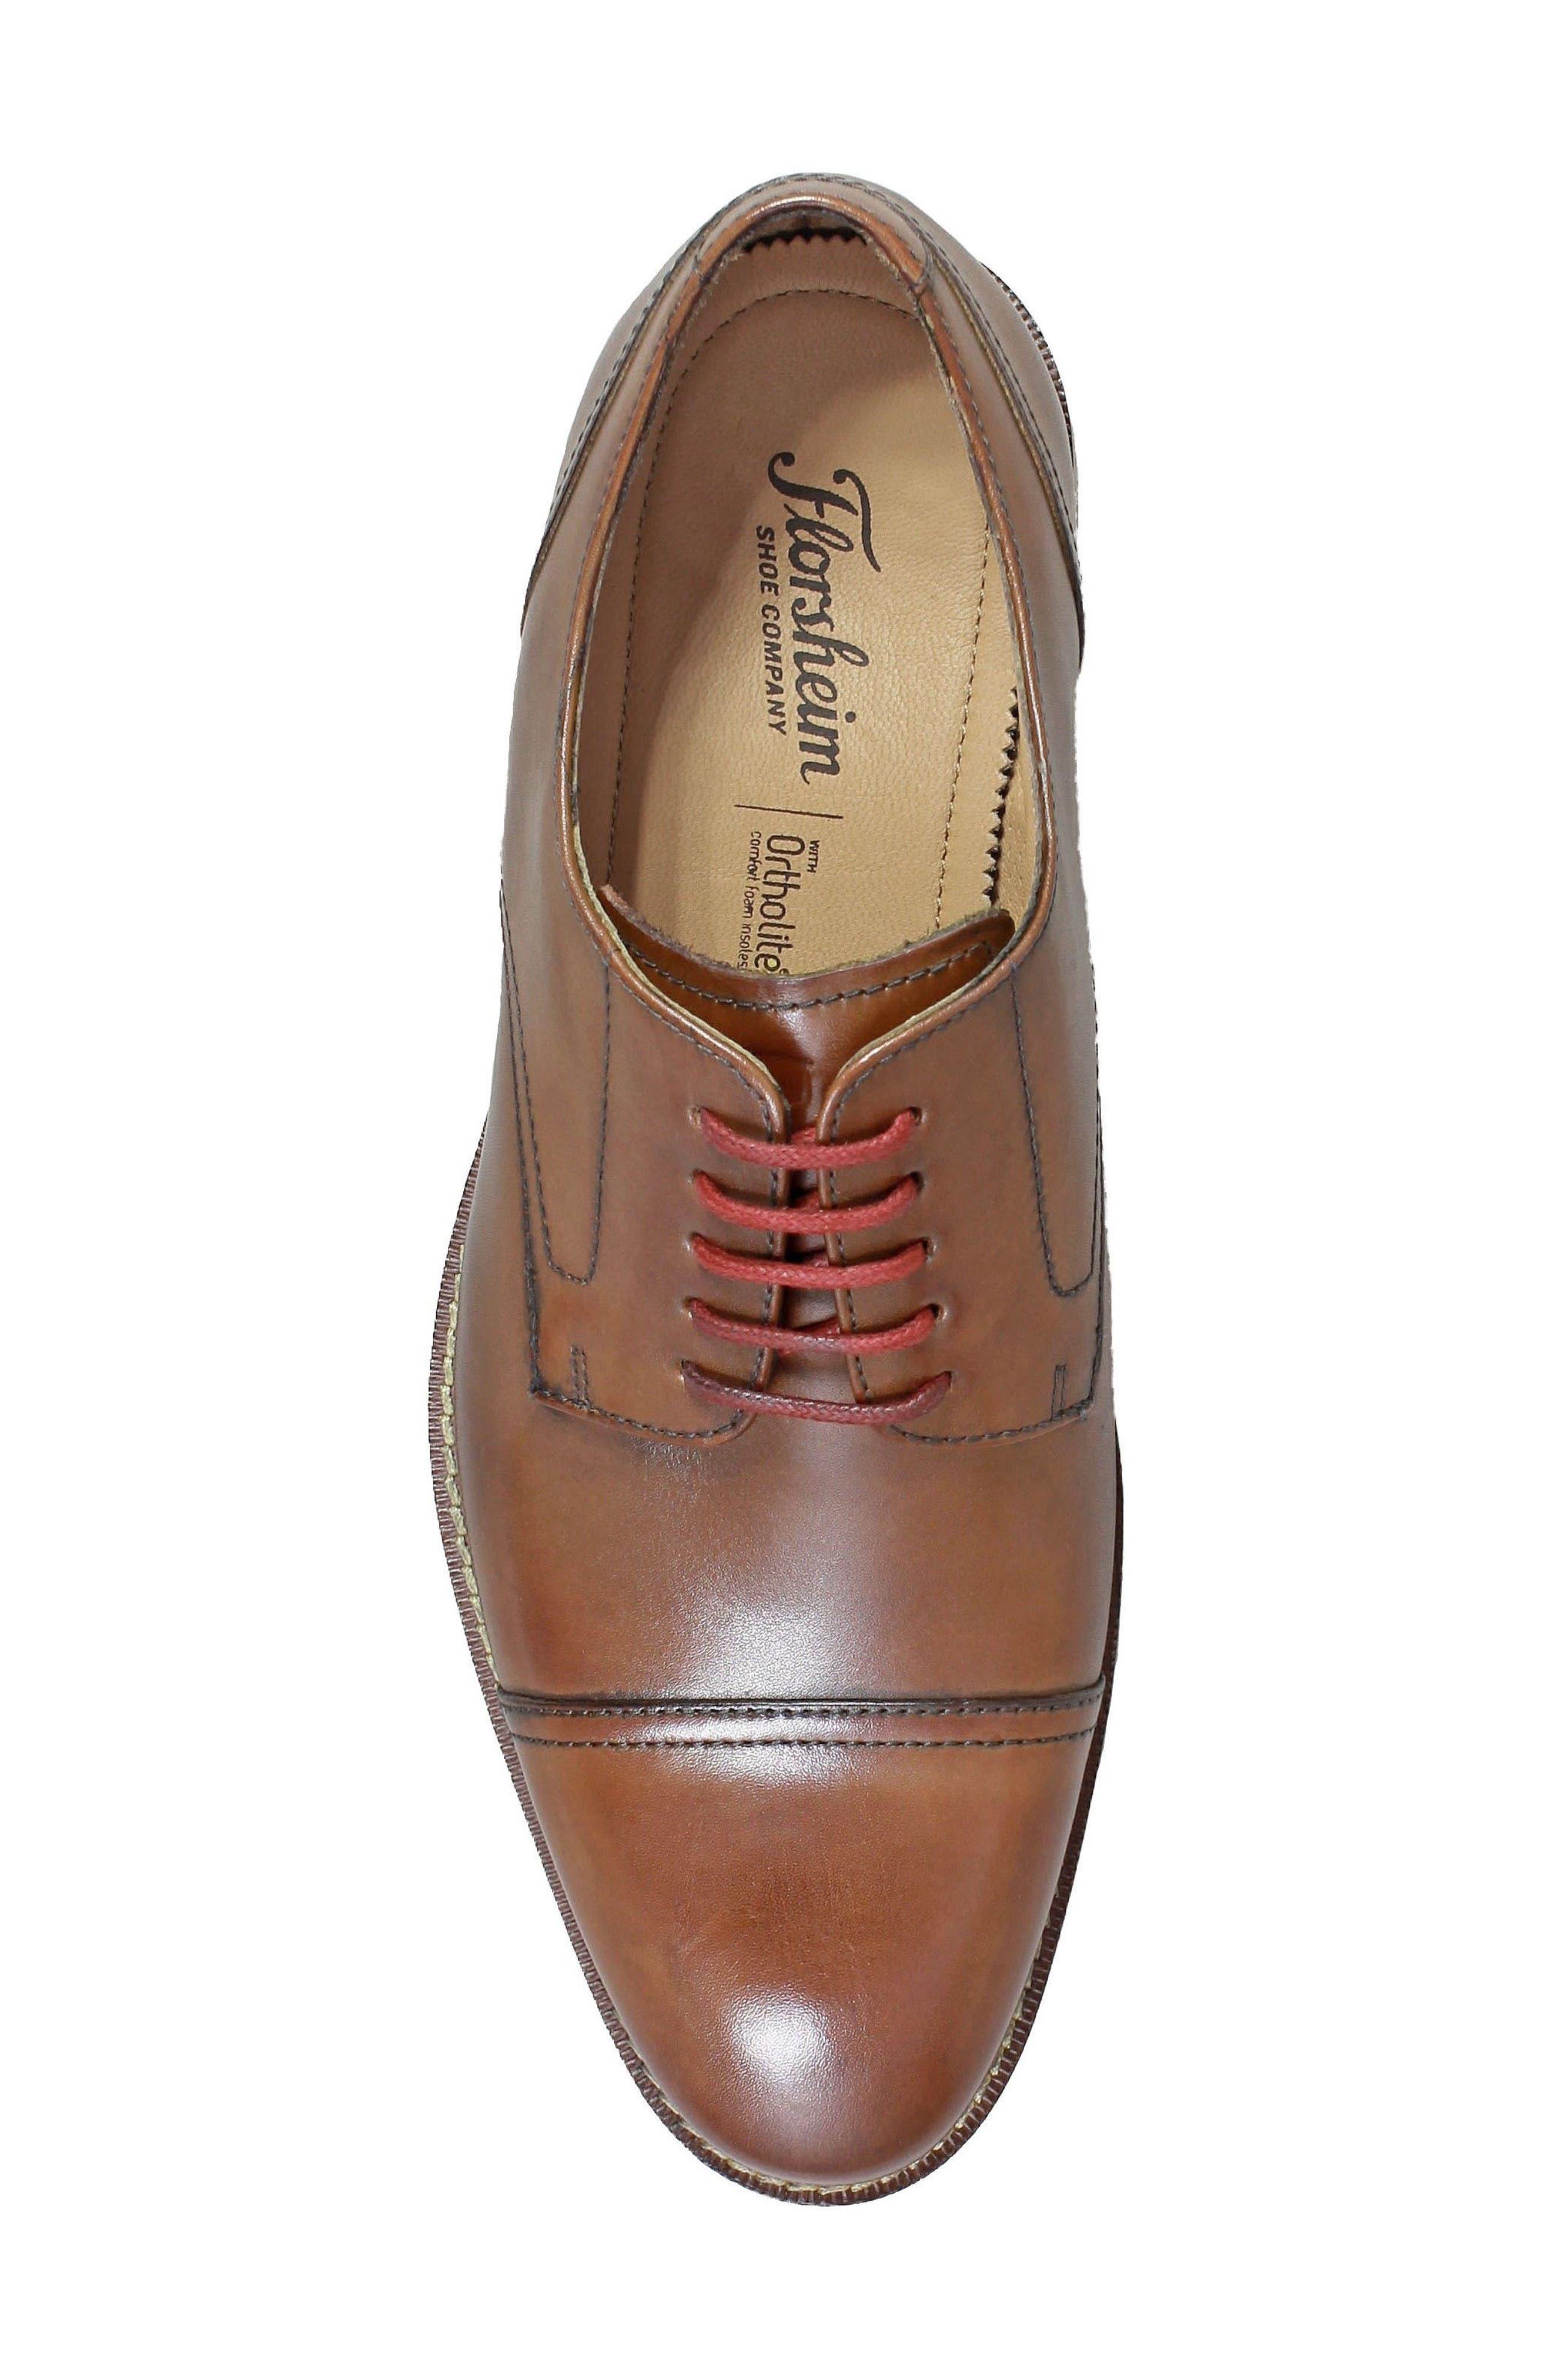 Salerno Wingtip,                             Alternate thumbnail 5, color,                             Cognac Leather